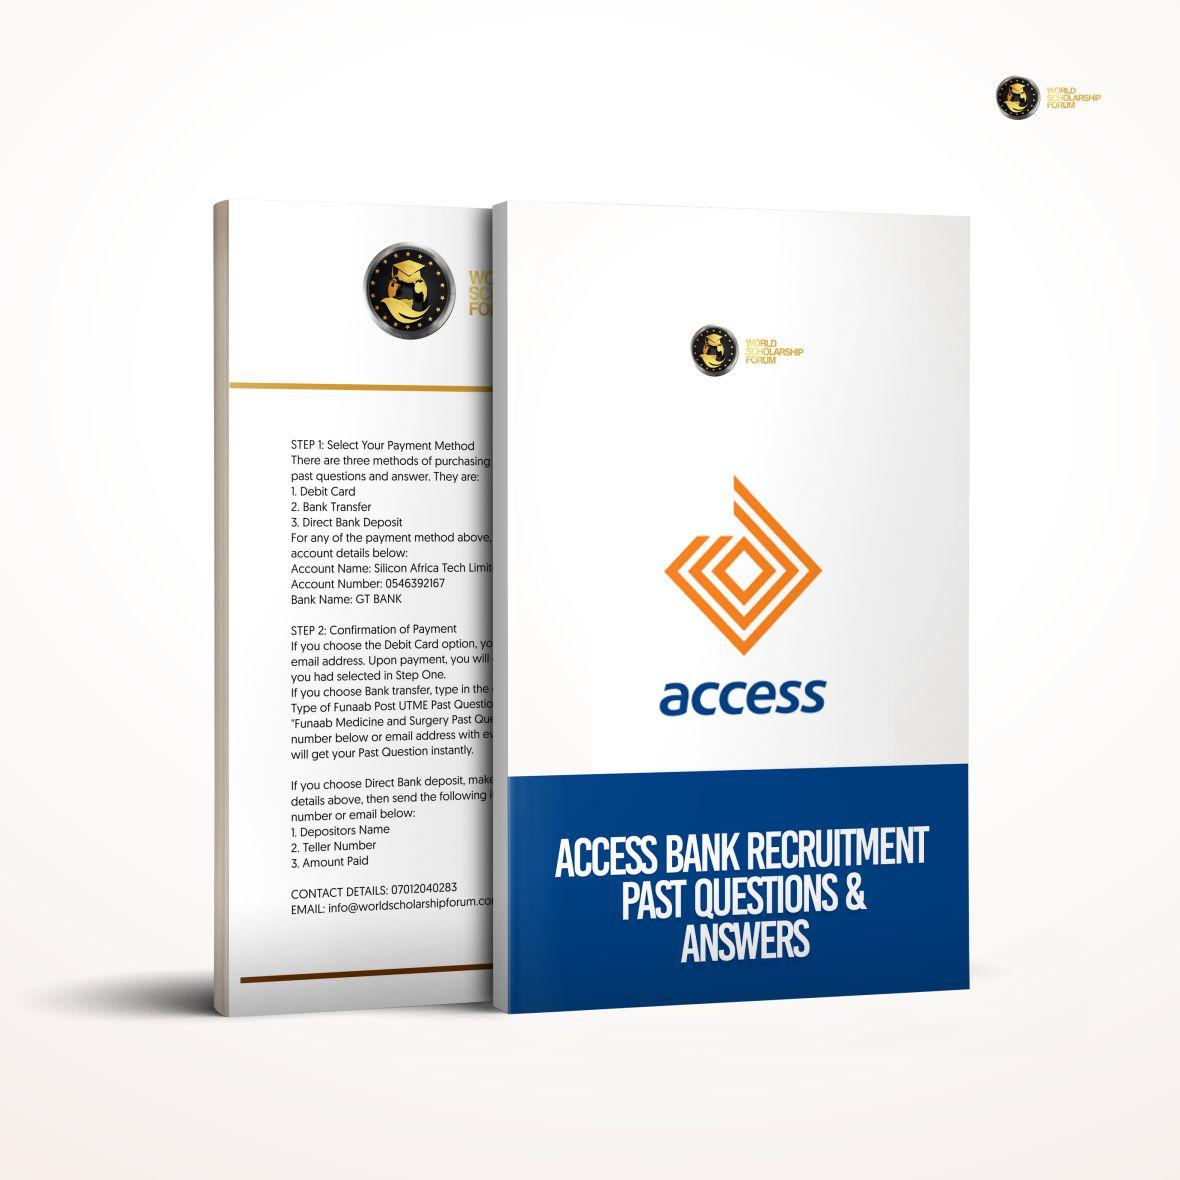 diamond-access-bank-recruitment-past-questions